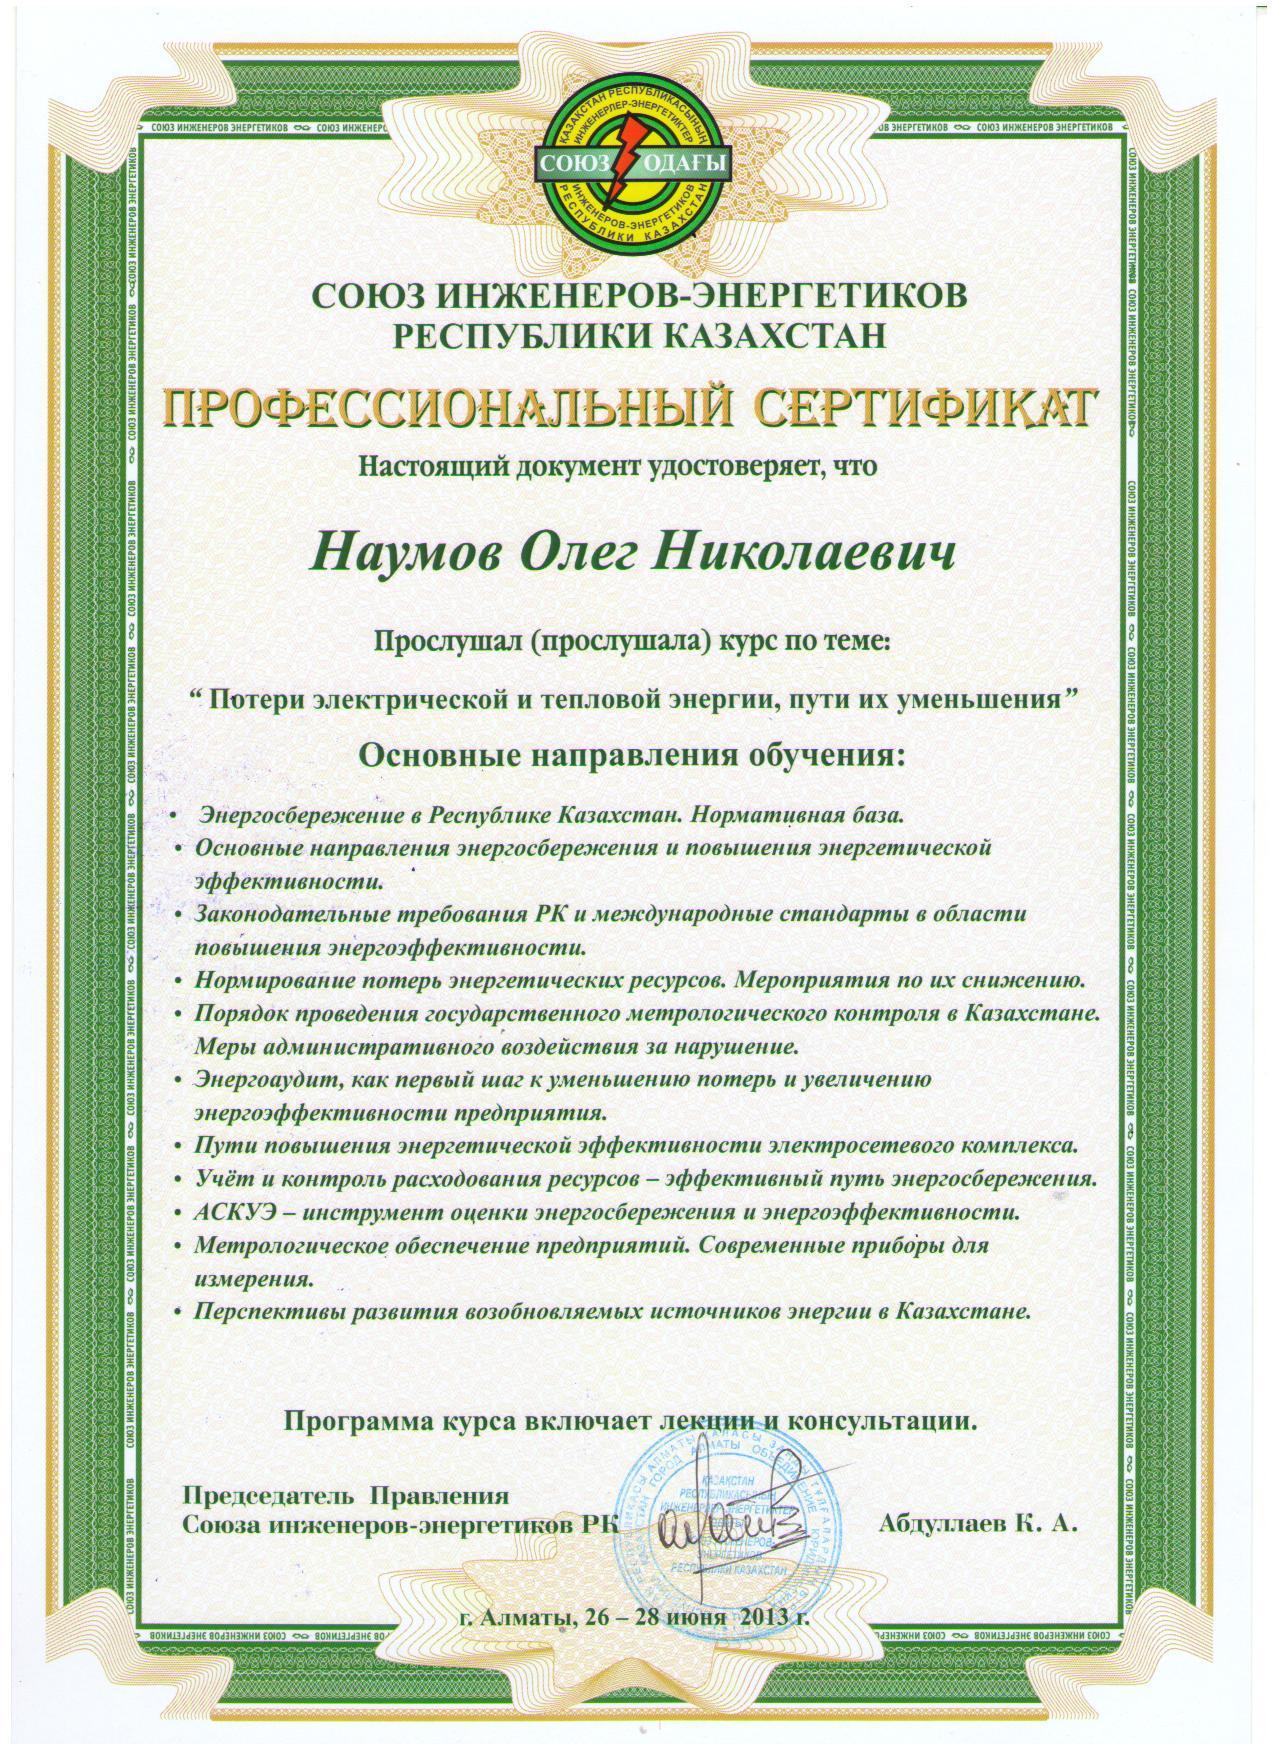 компания Махим - сертификат